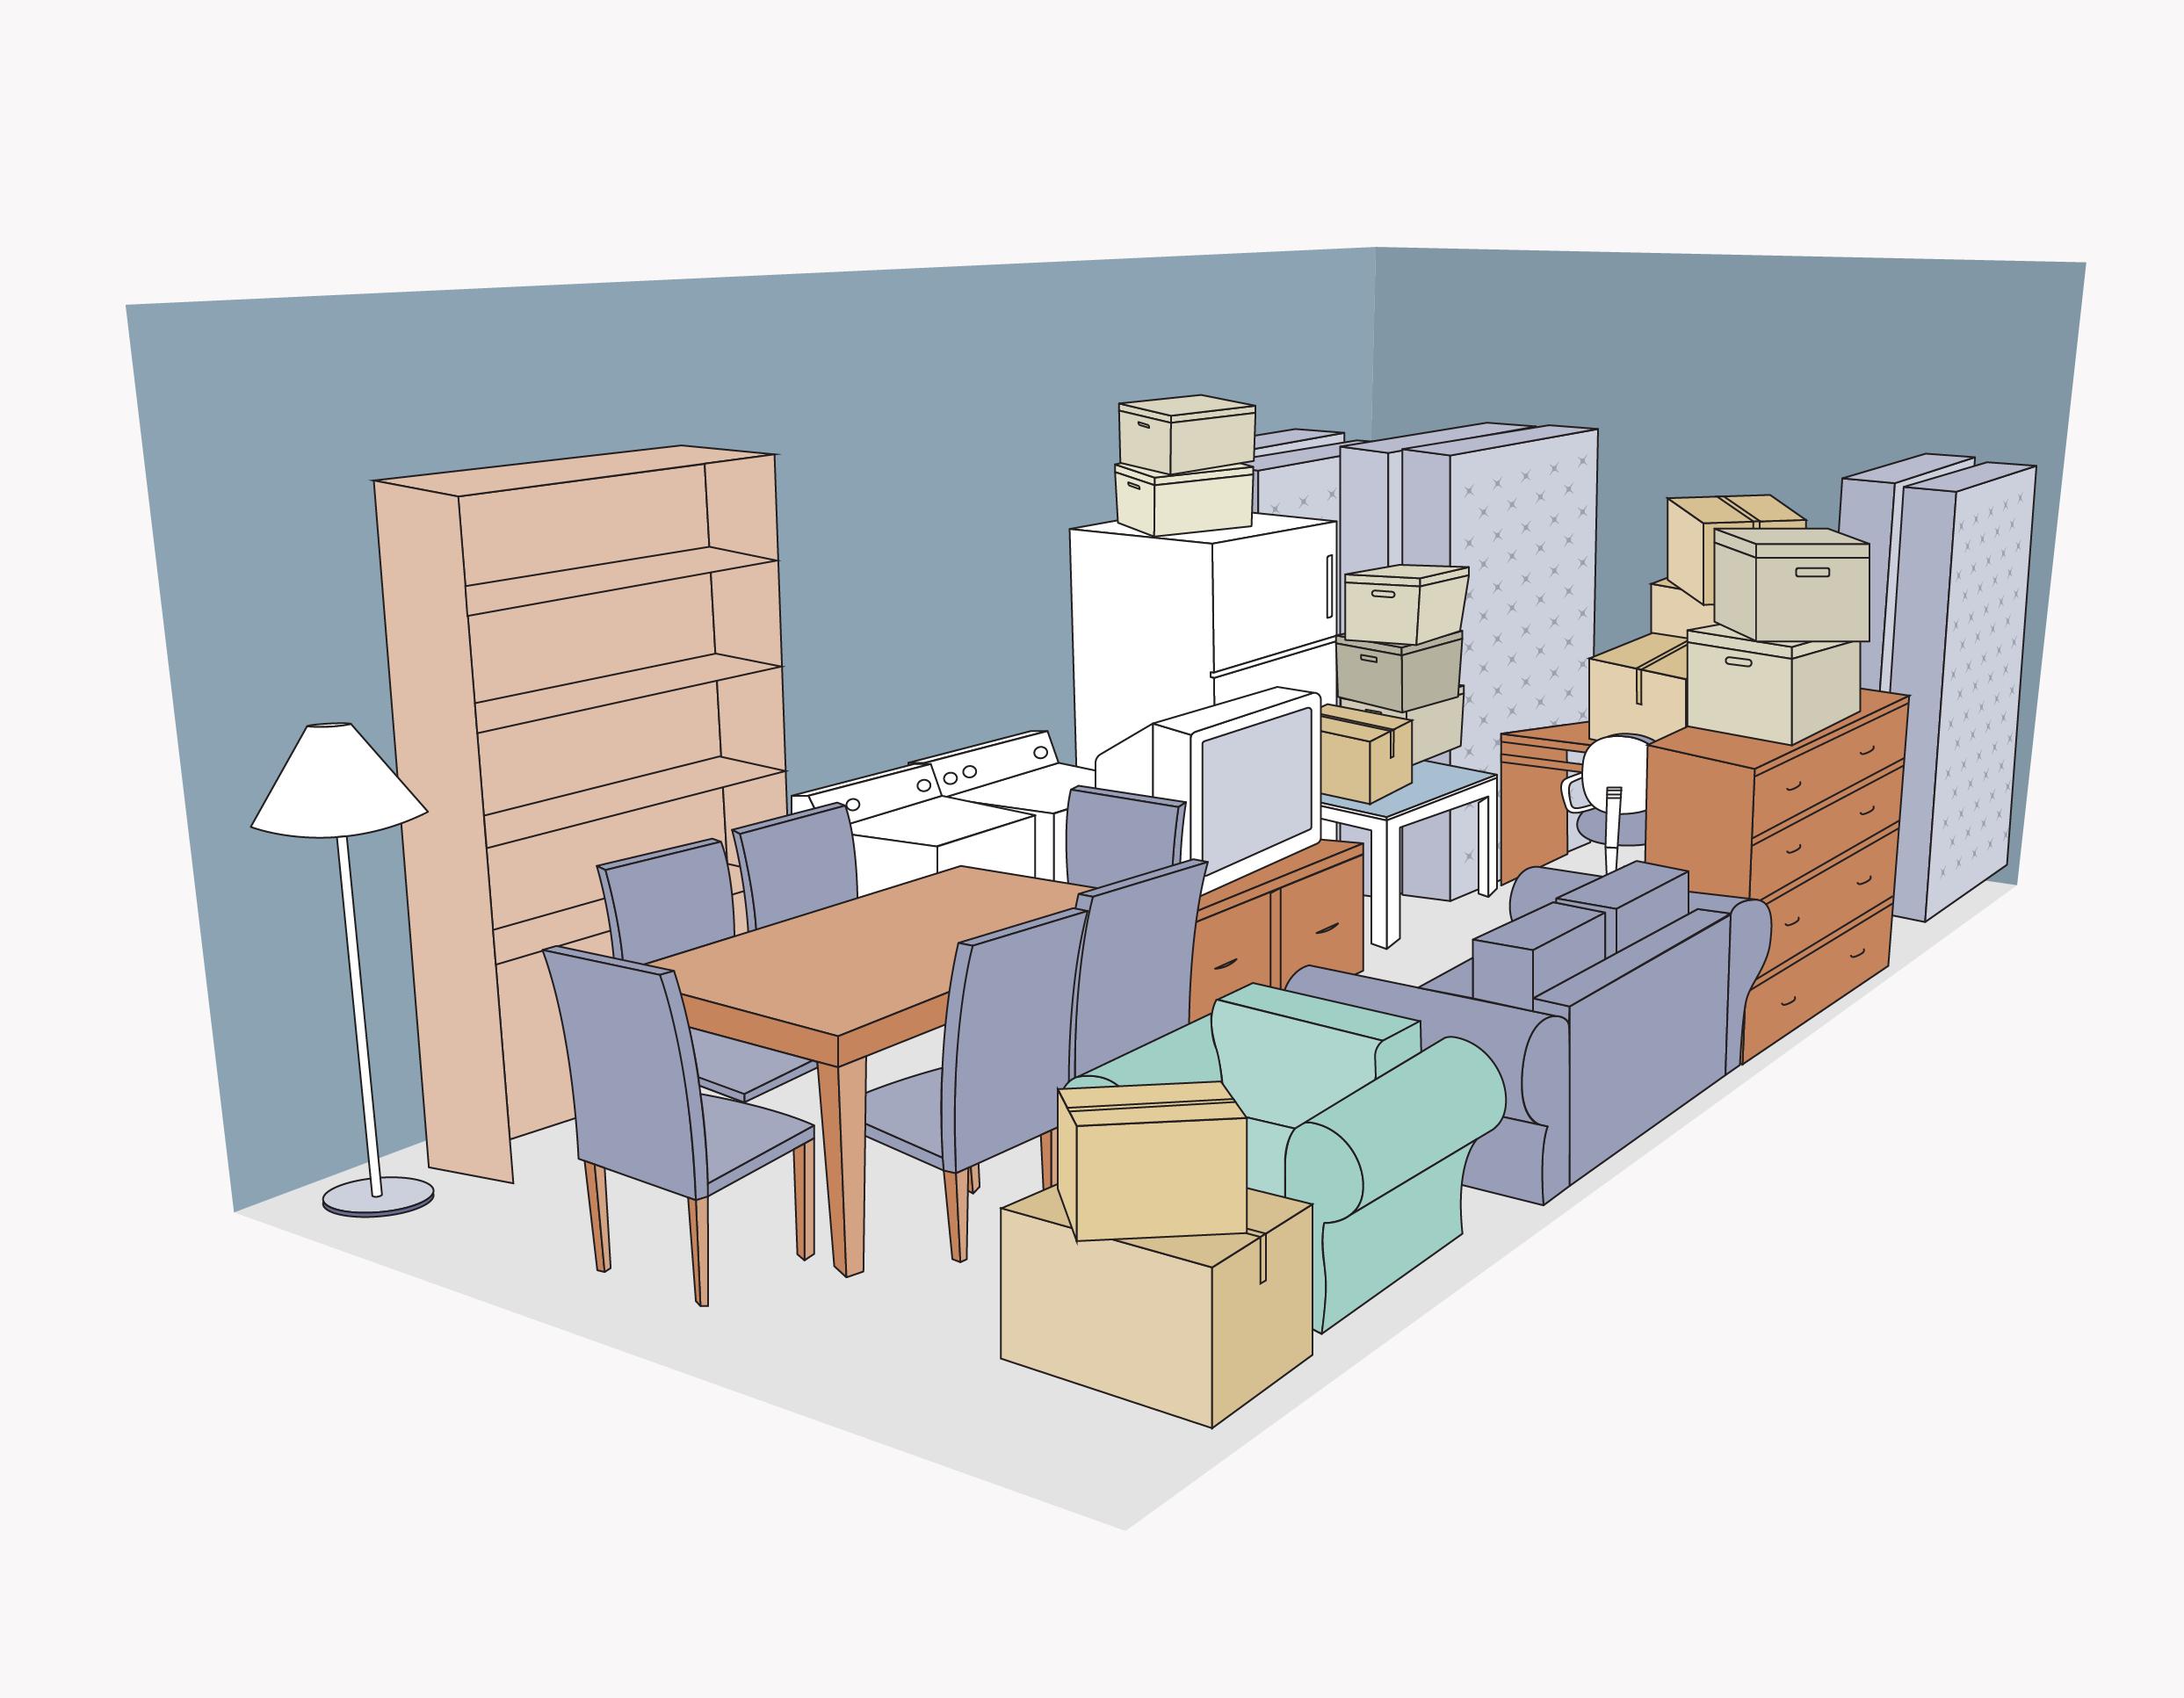 Mini Storage - 10x20